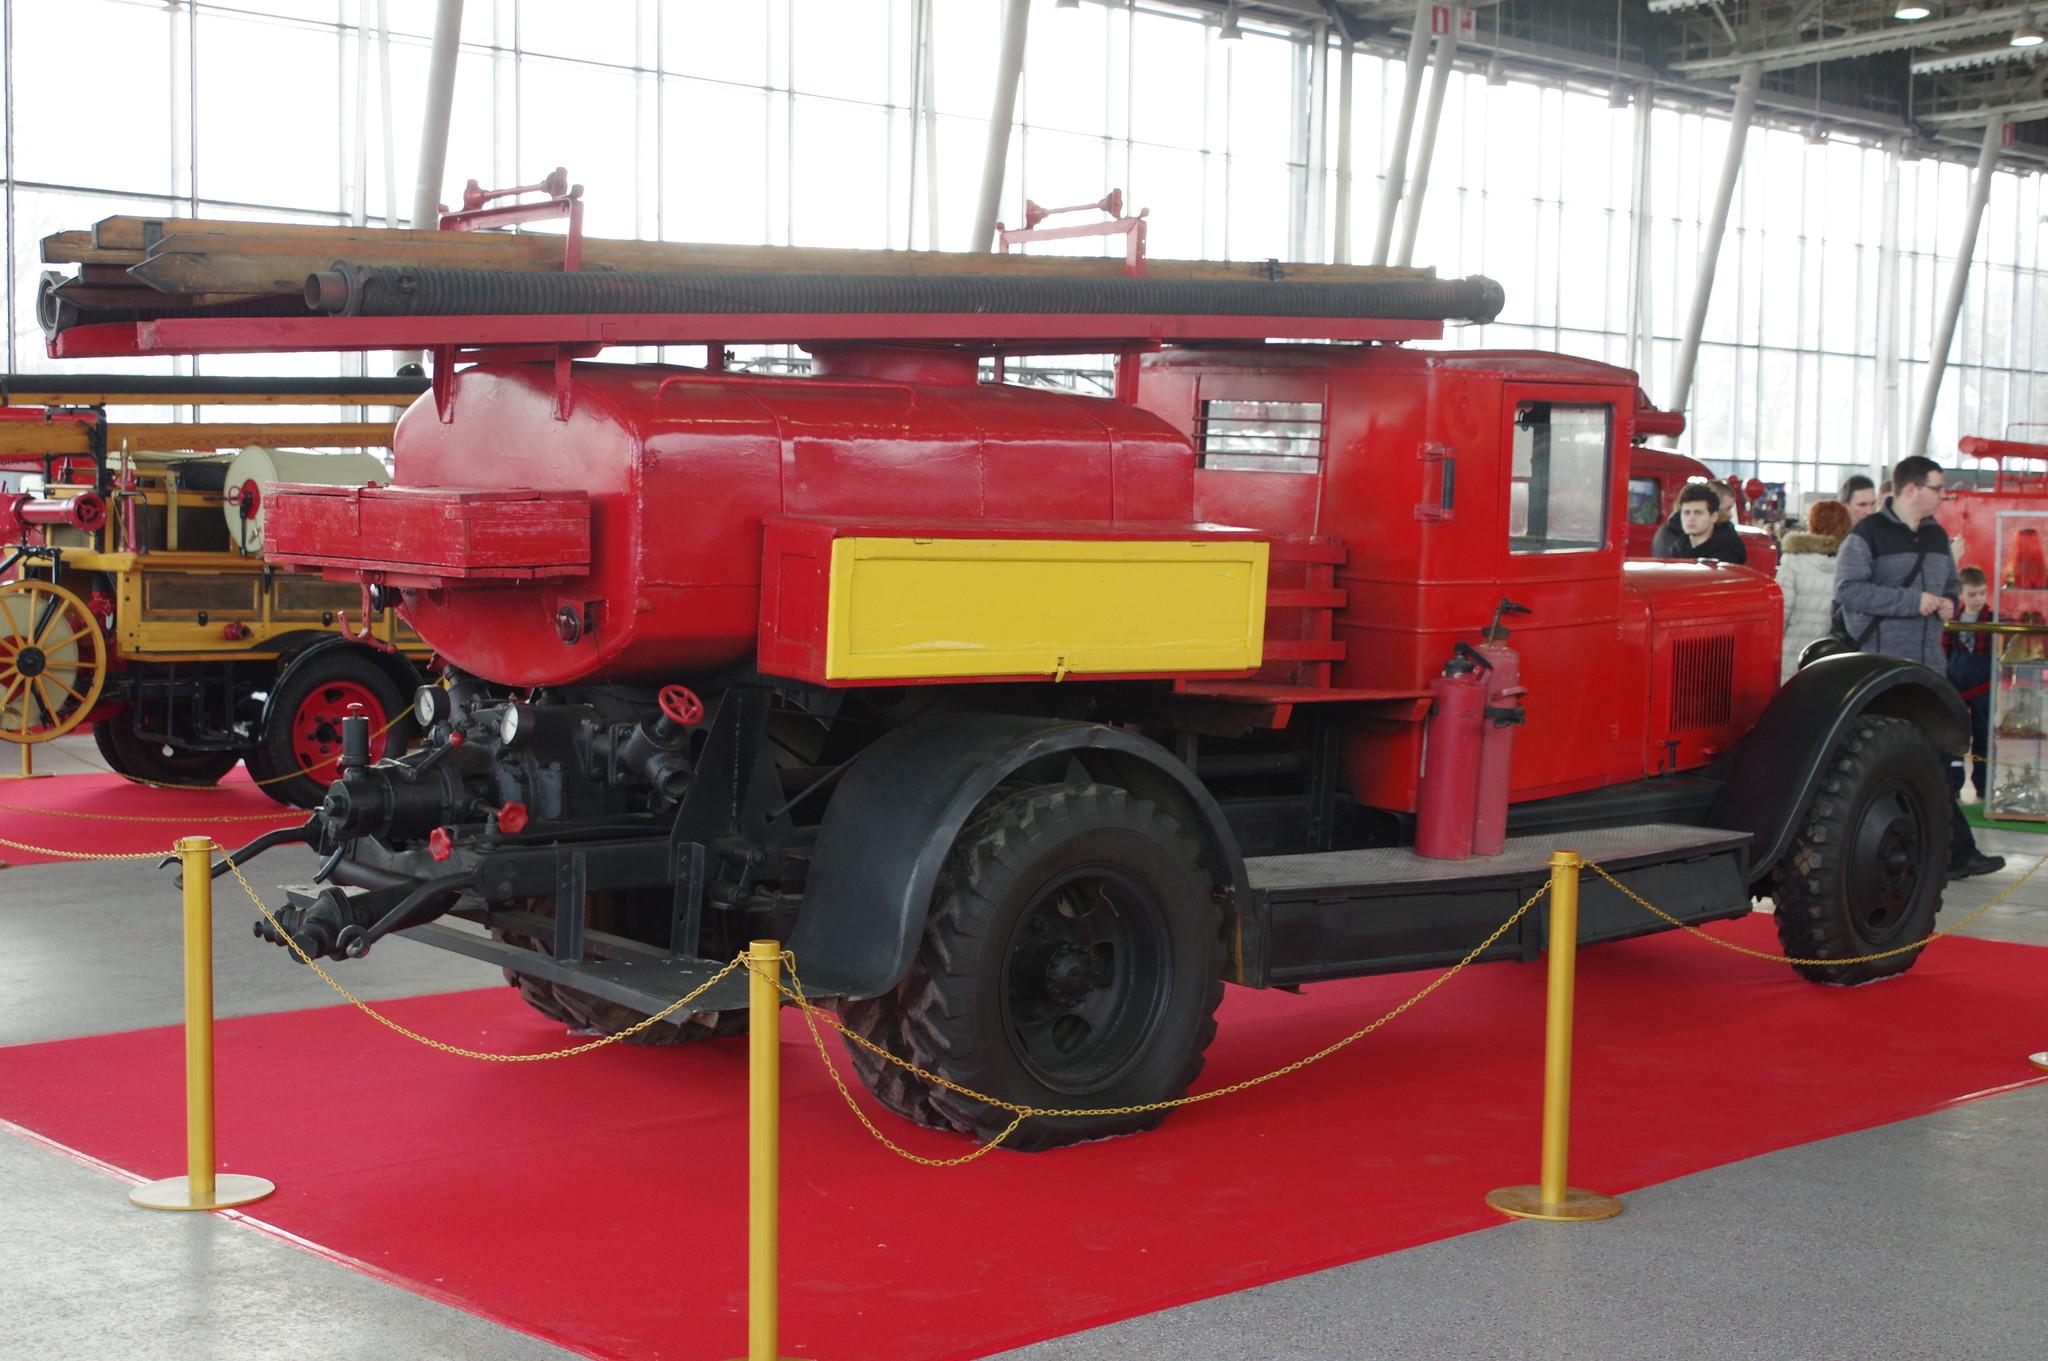 Пожарная автоцистерна ПМЗ-2 на шасси ЗИС-5. 1936 год